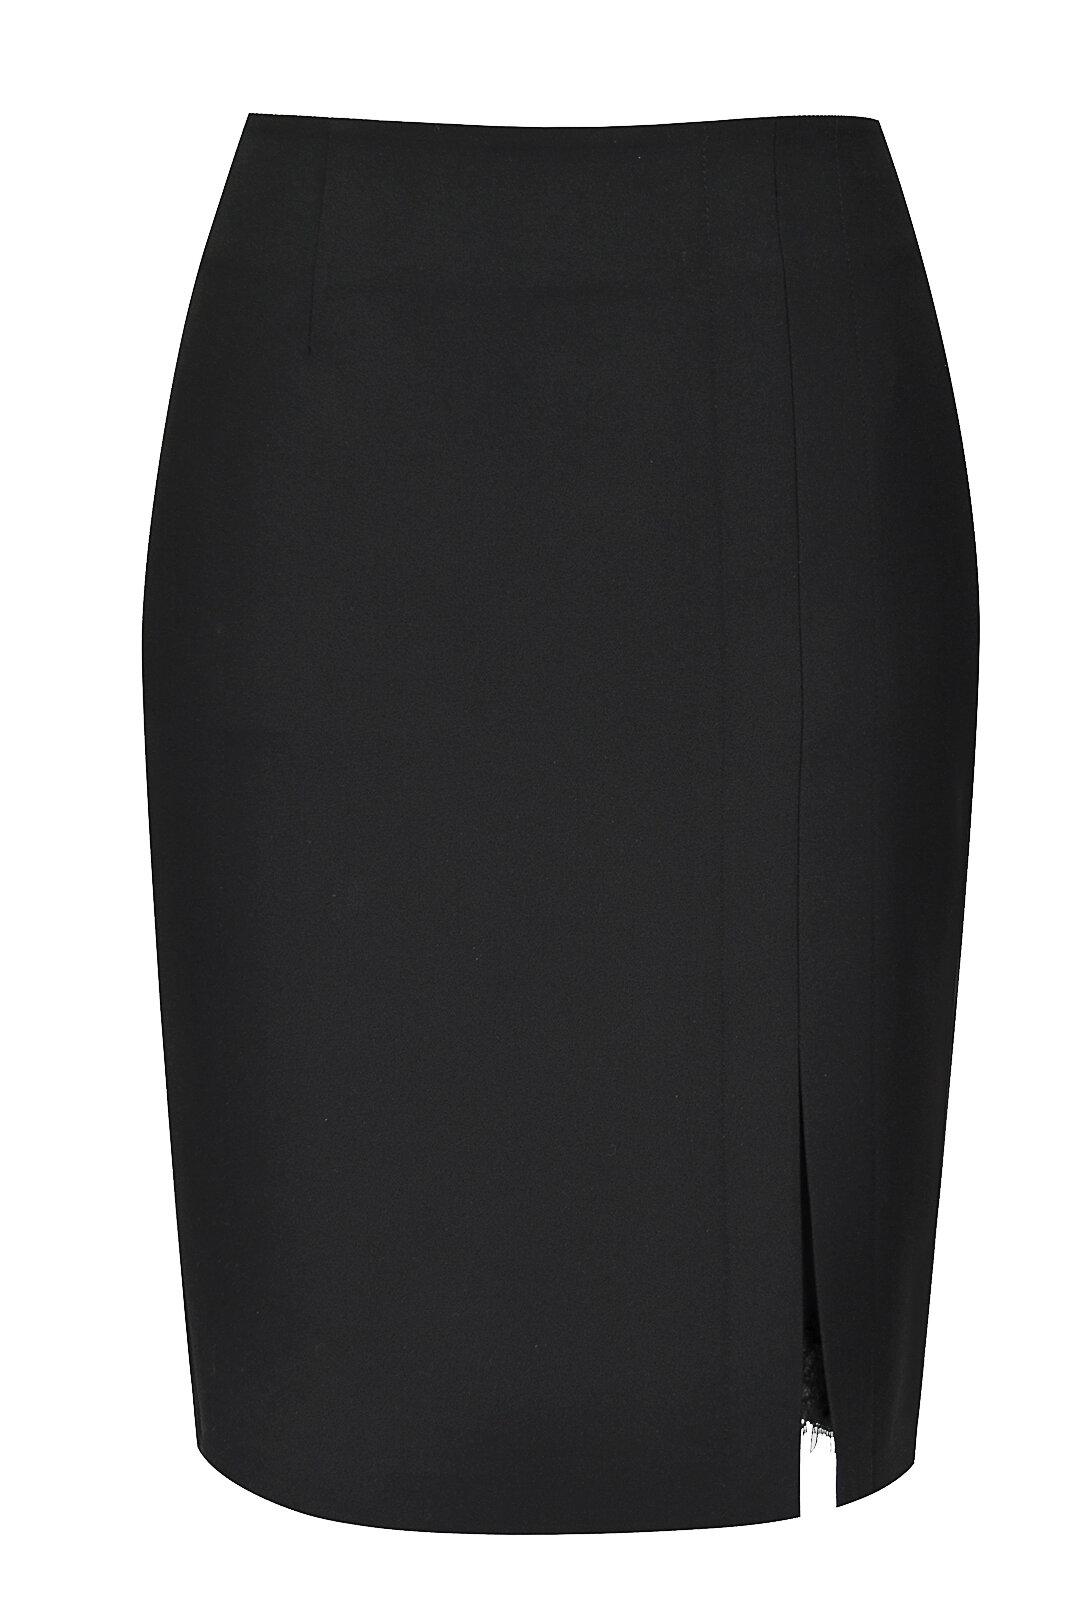 Модели юбки карандаш фото